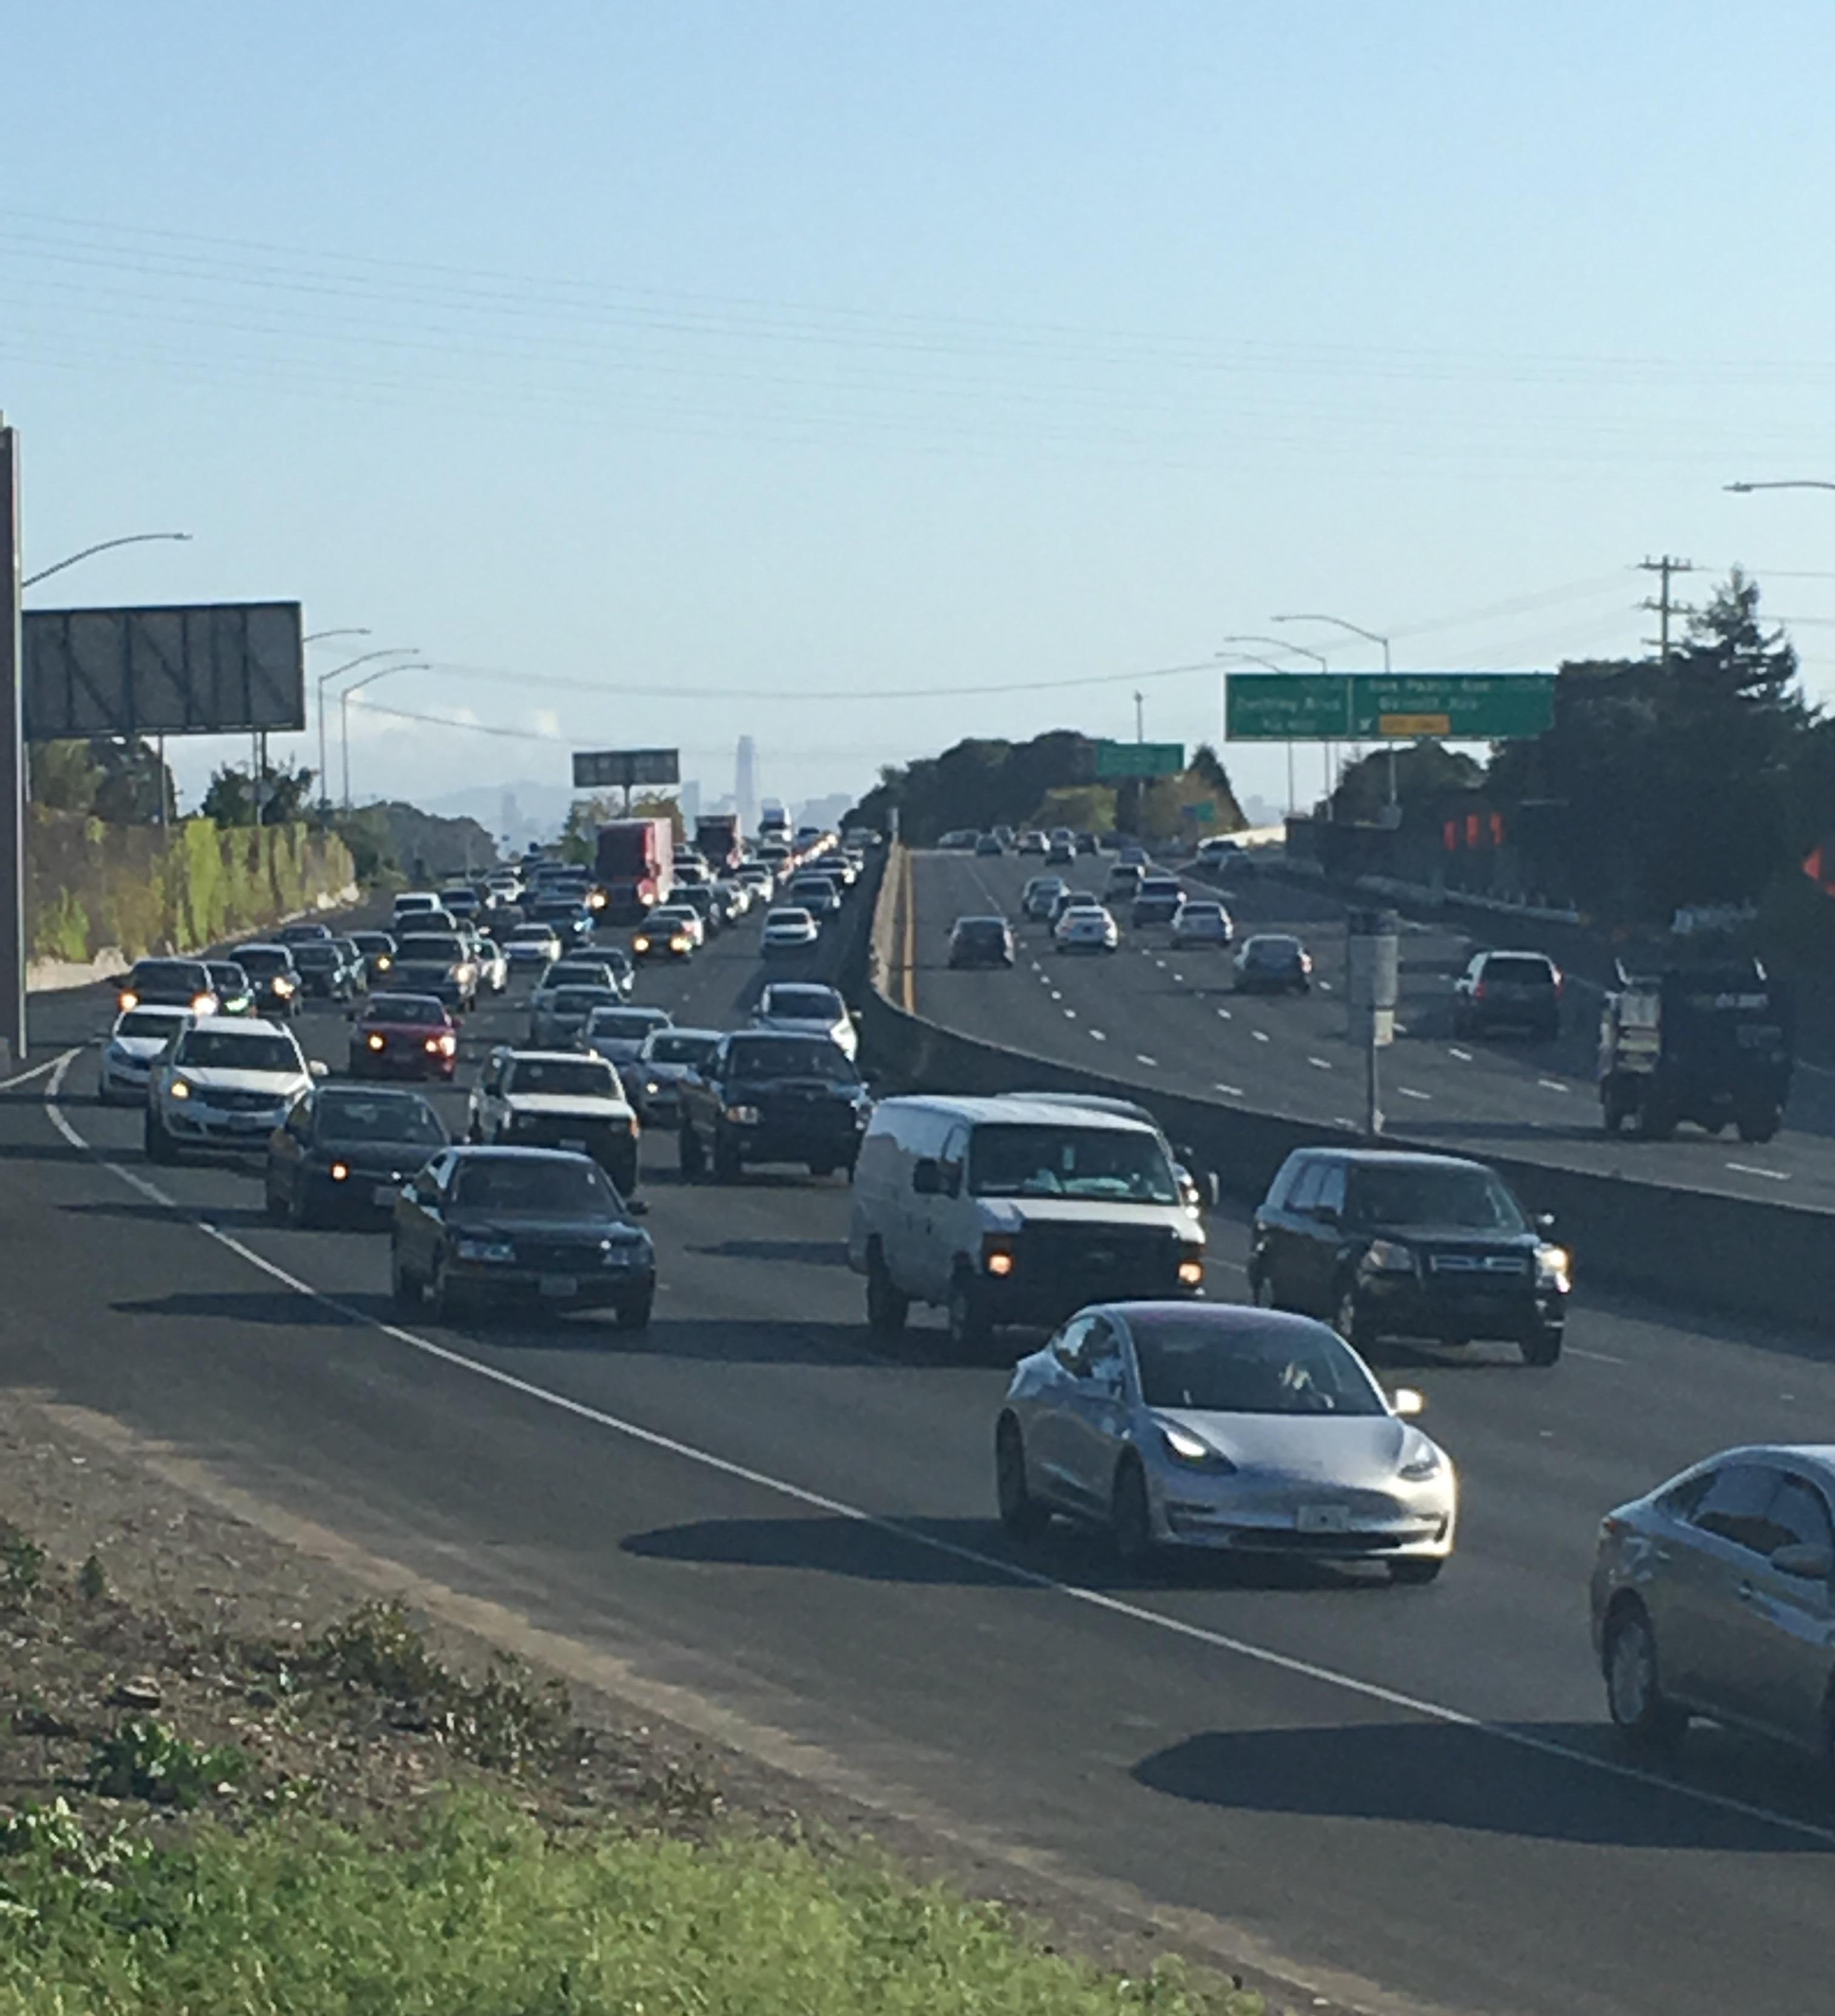 Unclogging I-80 Requires More Transportation Options